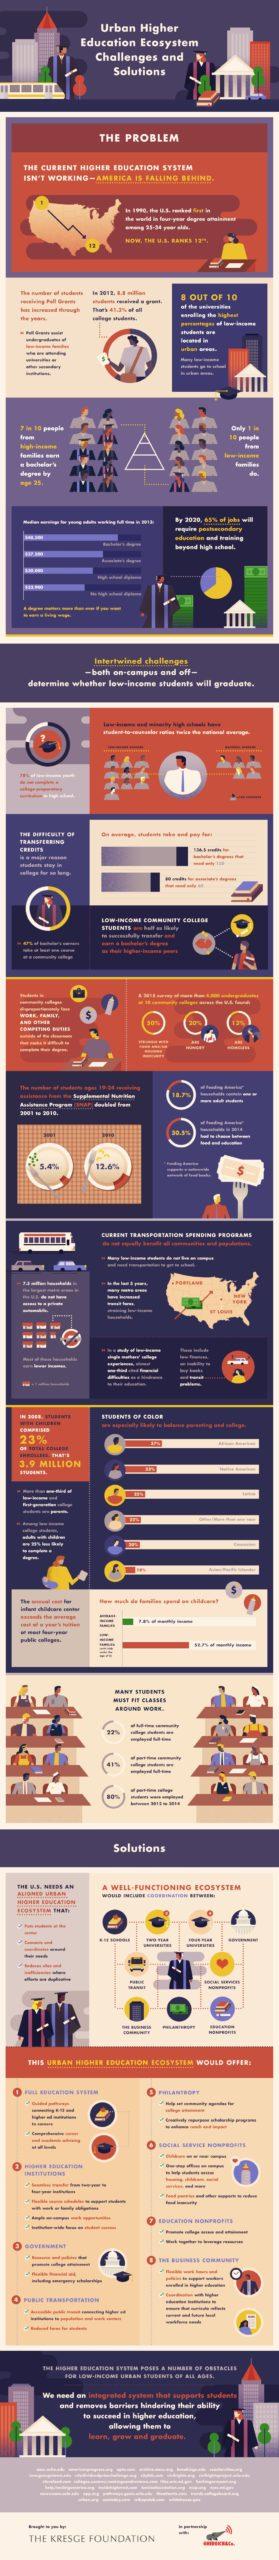 urban-education-infographic_1.jpg